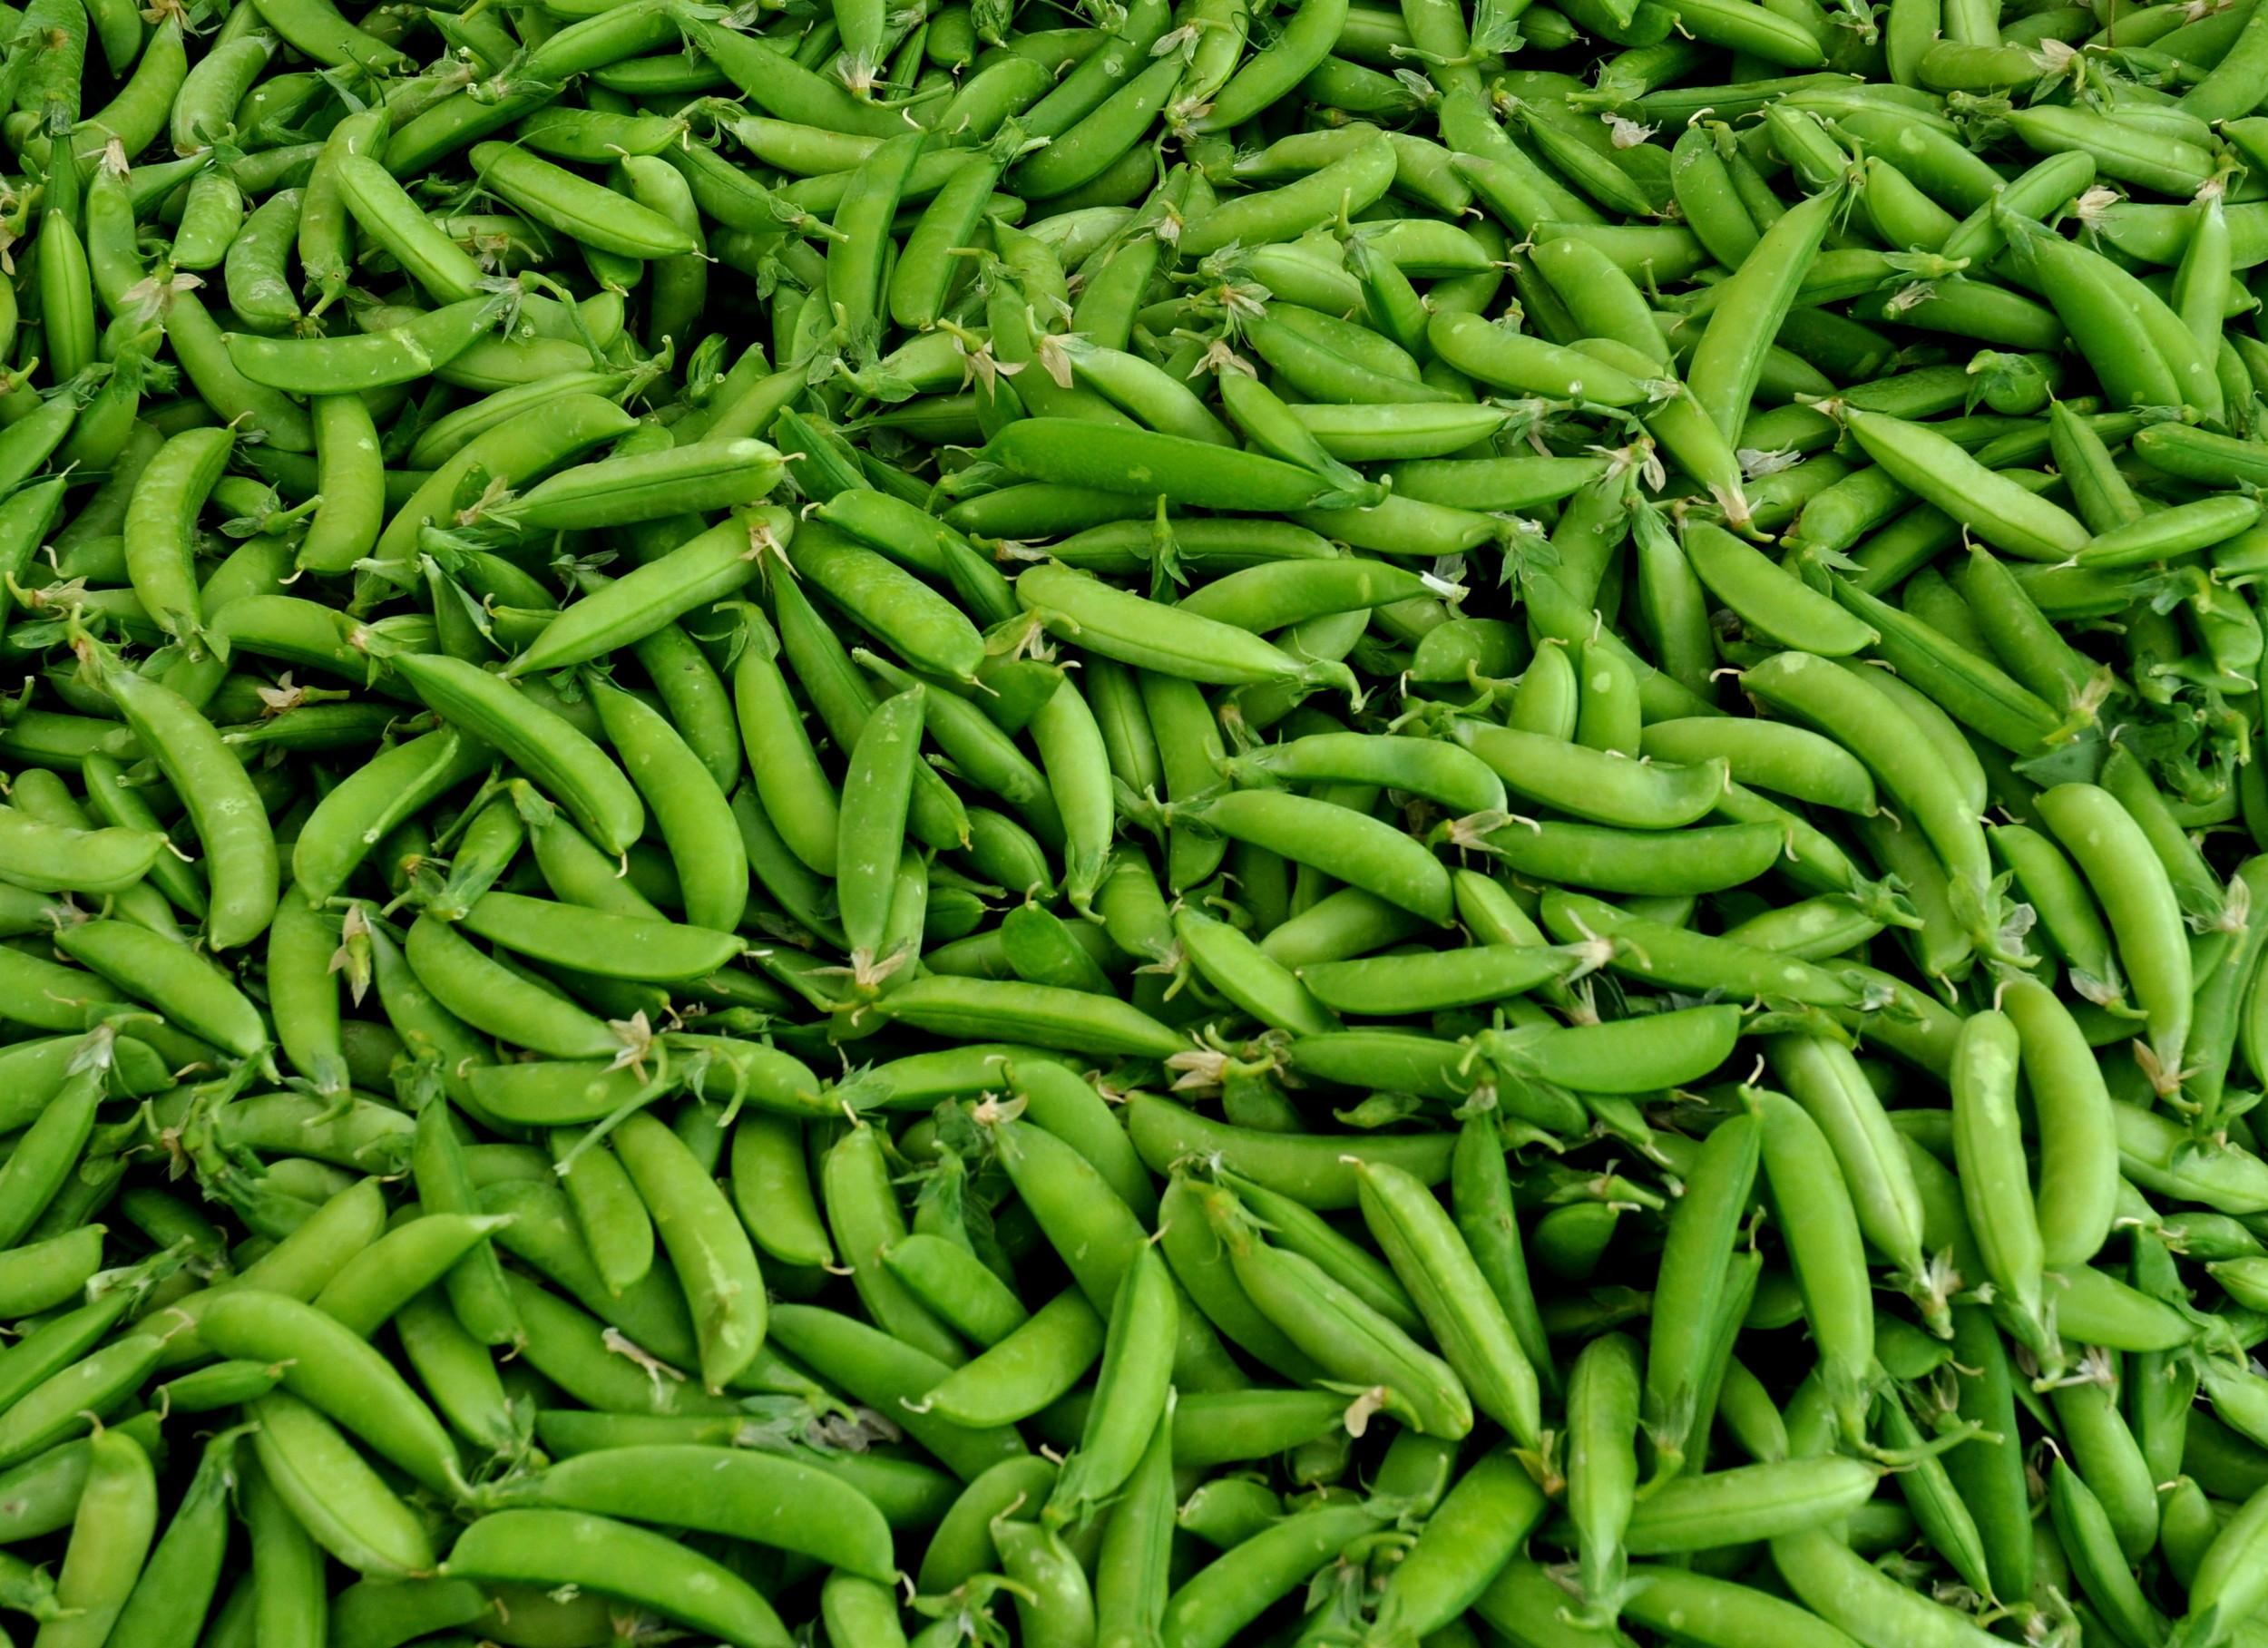 Sugar snap peas from Alvarez Organic Farms. Photo copyright 2012 by Zachary D. Lyons.